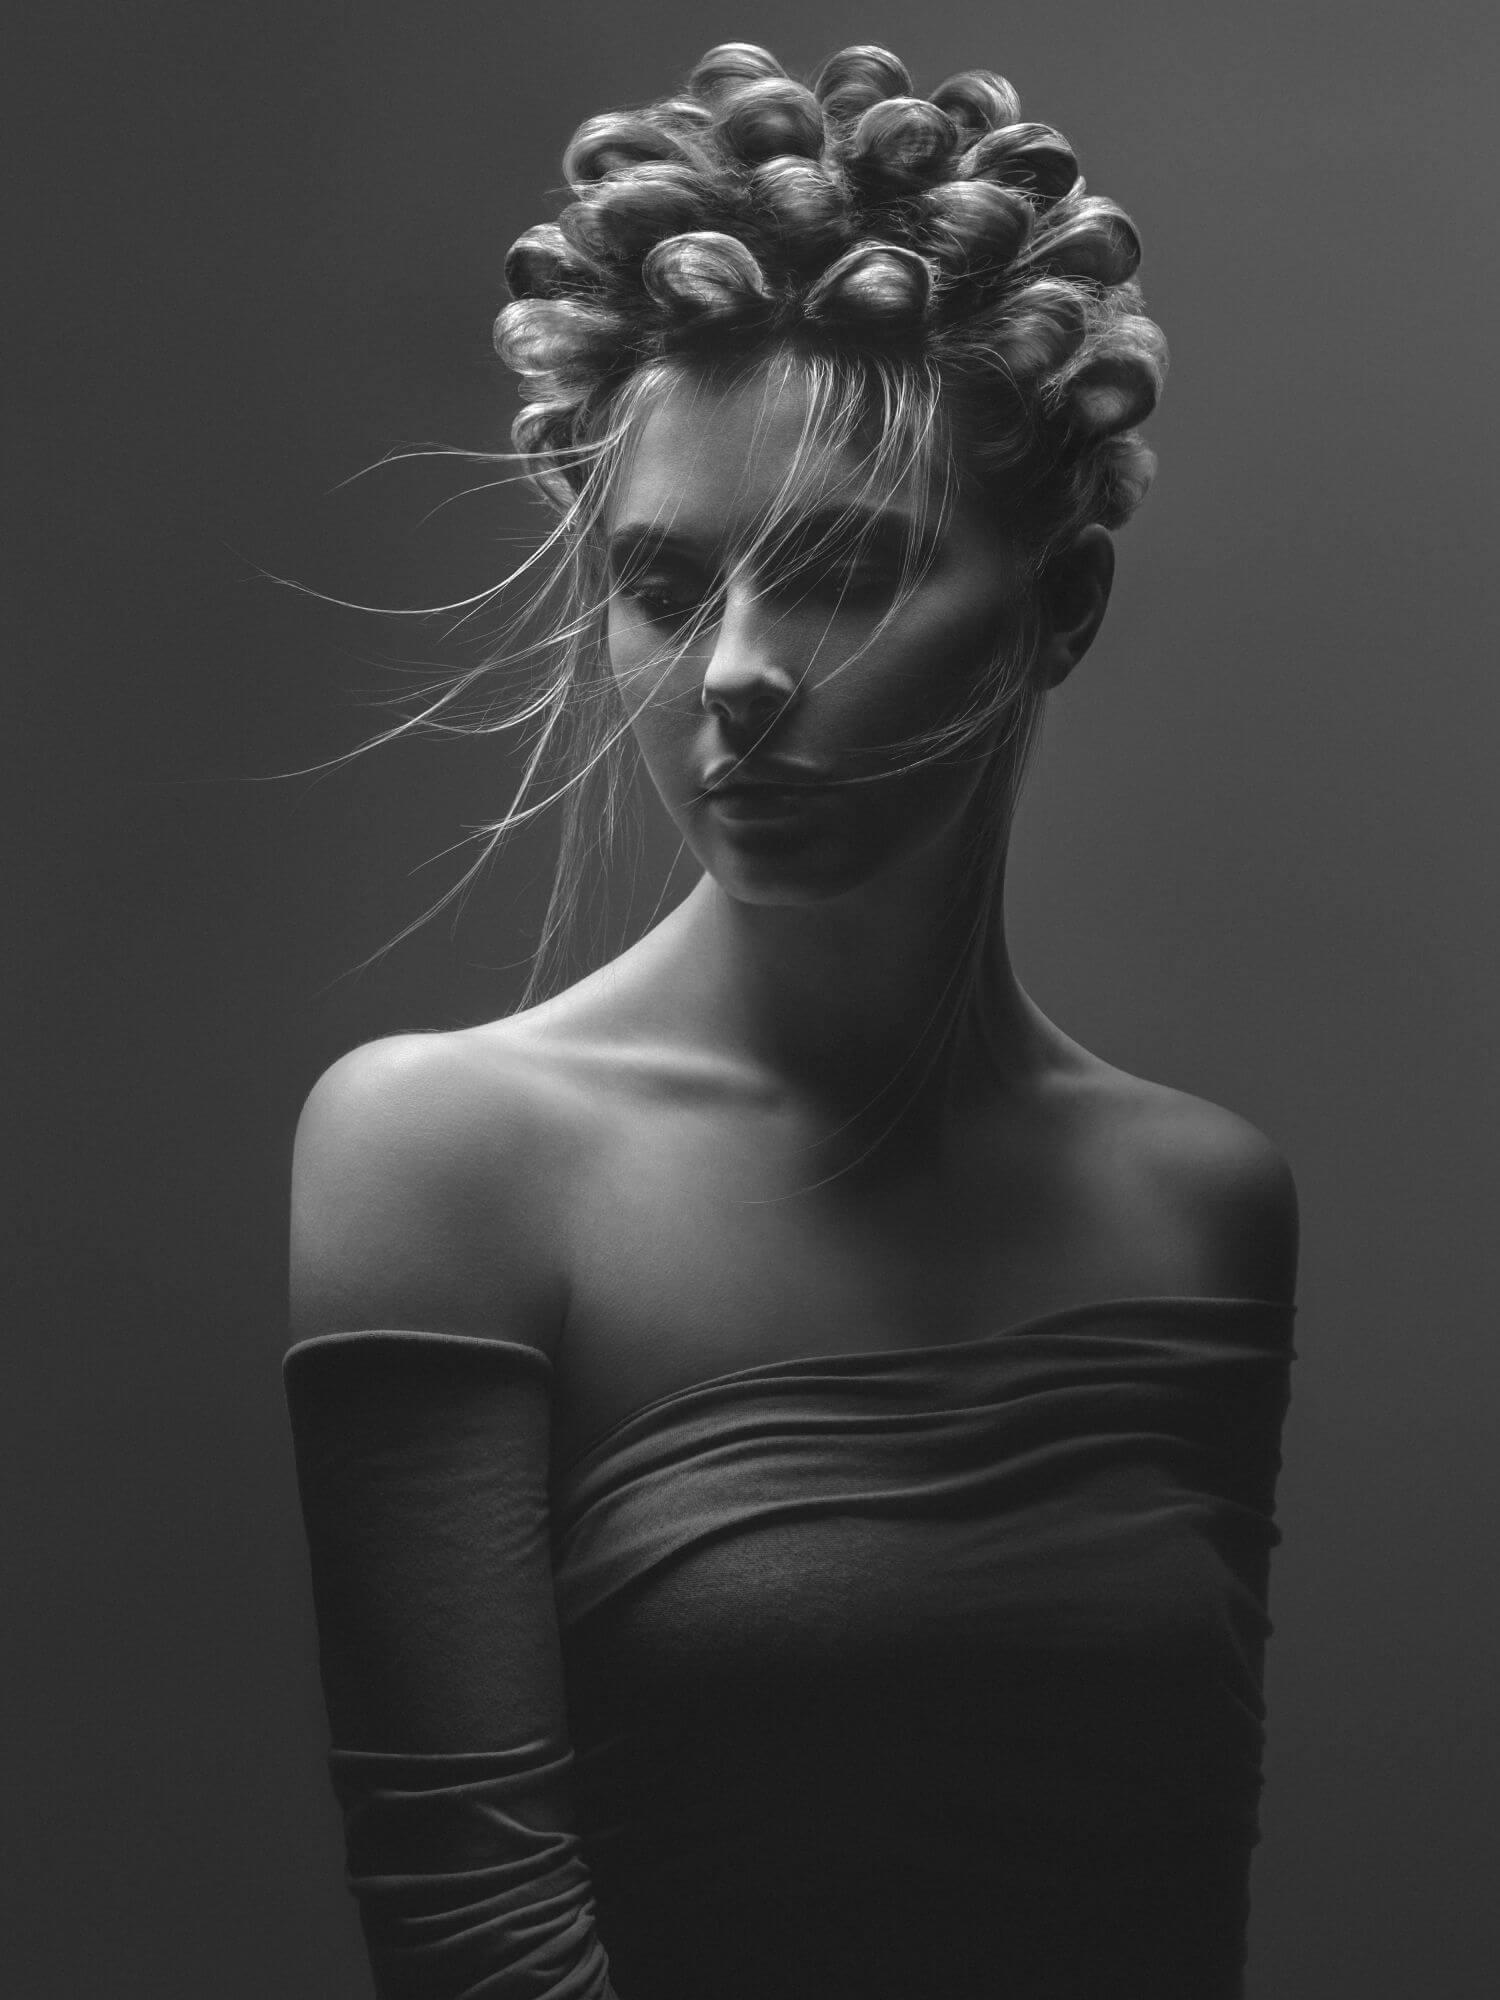 Михал Баран, Ирландия / Michal Baran, Ireland, Победитель категории «Красота и Мода», Фотоконкурс Hasselblad Masters